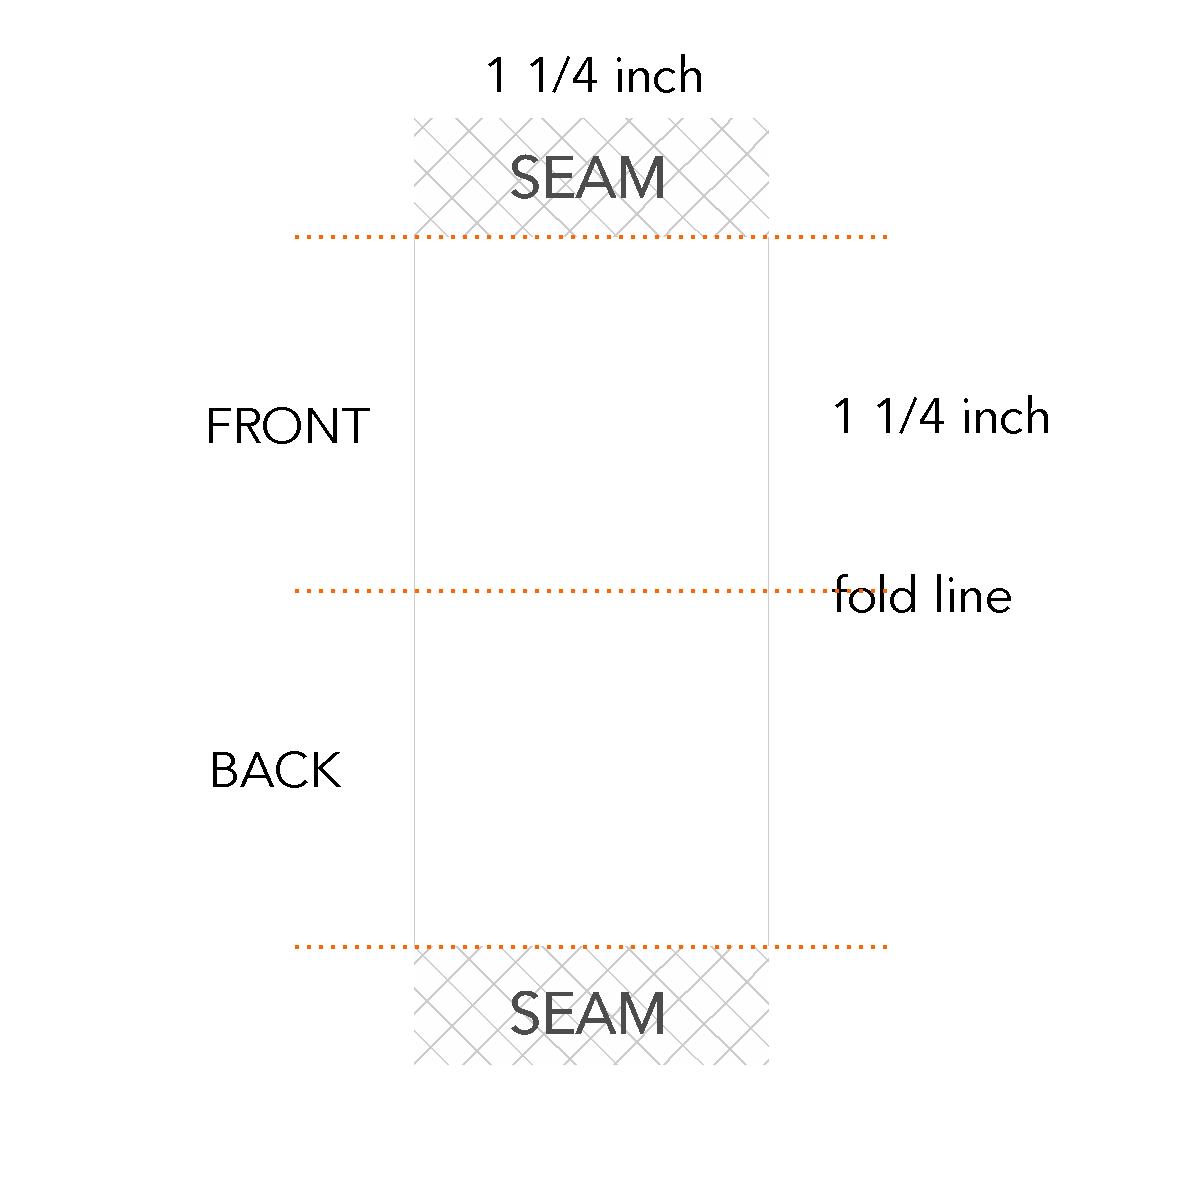 1 1/4 x 1 1/4 inch